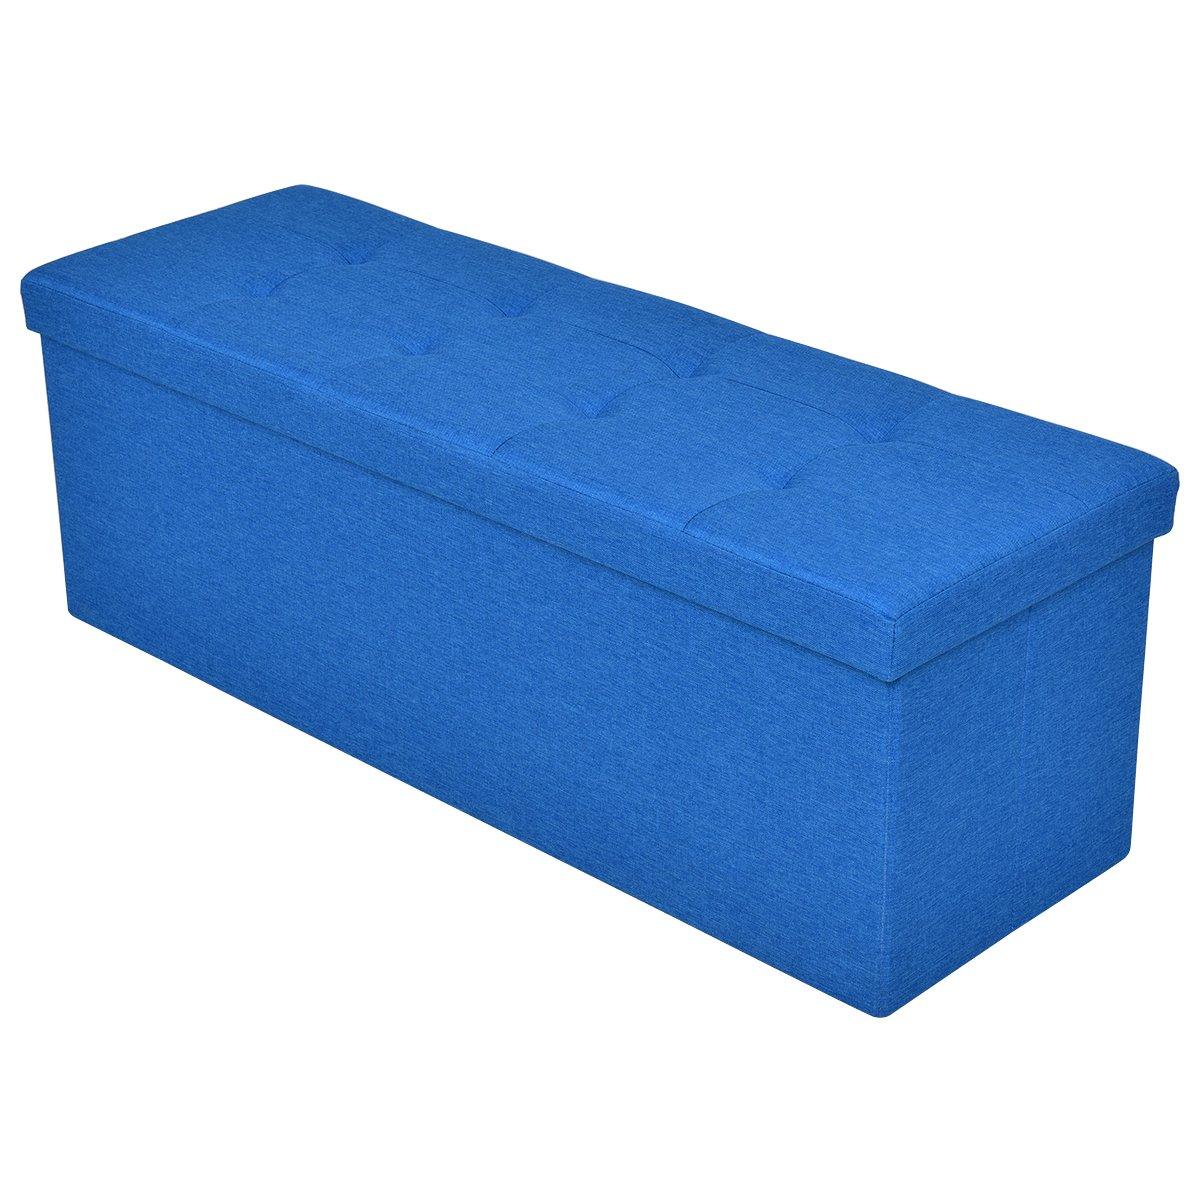 Giantex 43''x15''x15'' Large Folding Storage Ottoman Coffee Table Foot Rest Stool (Blue)